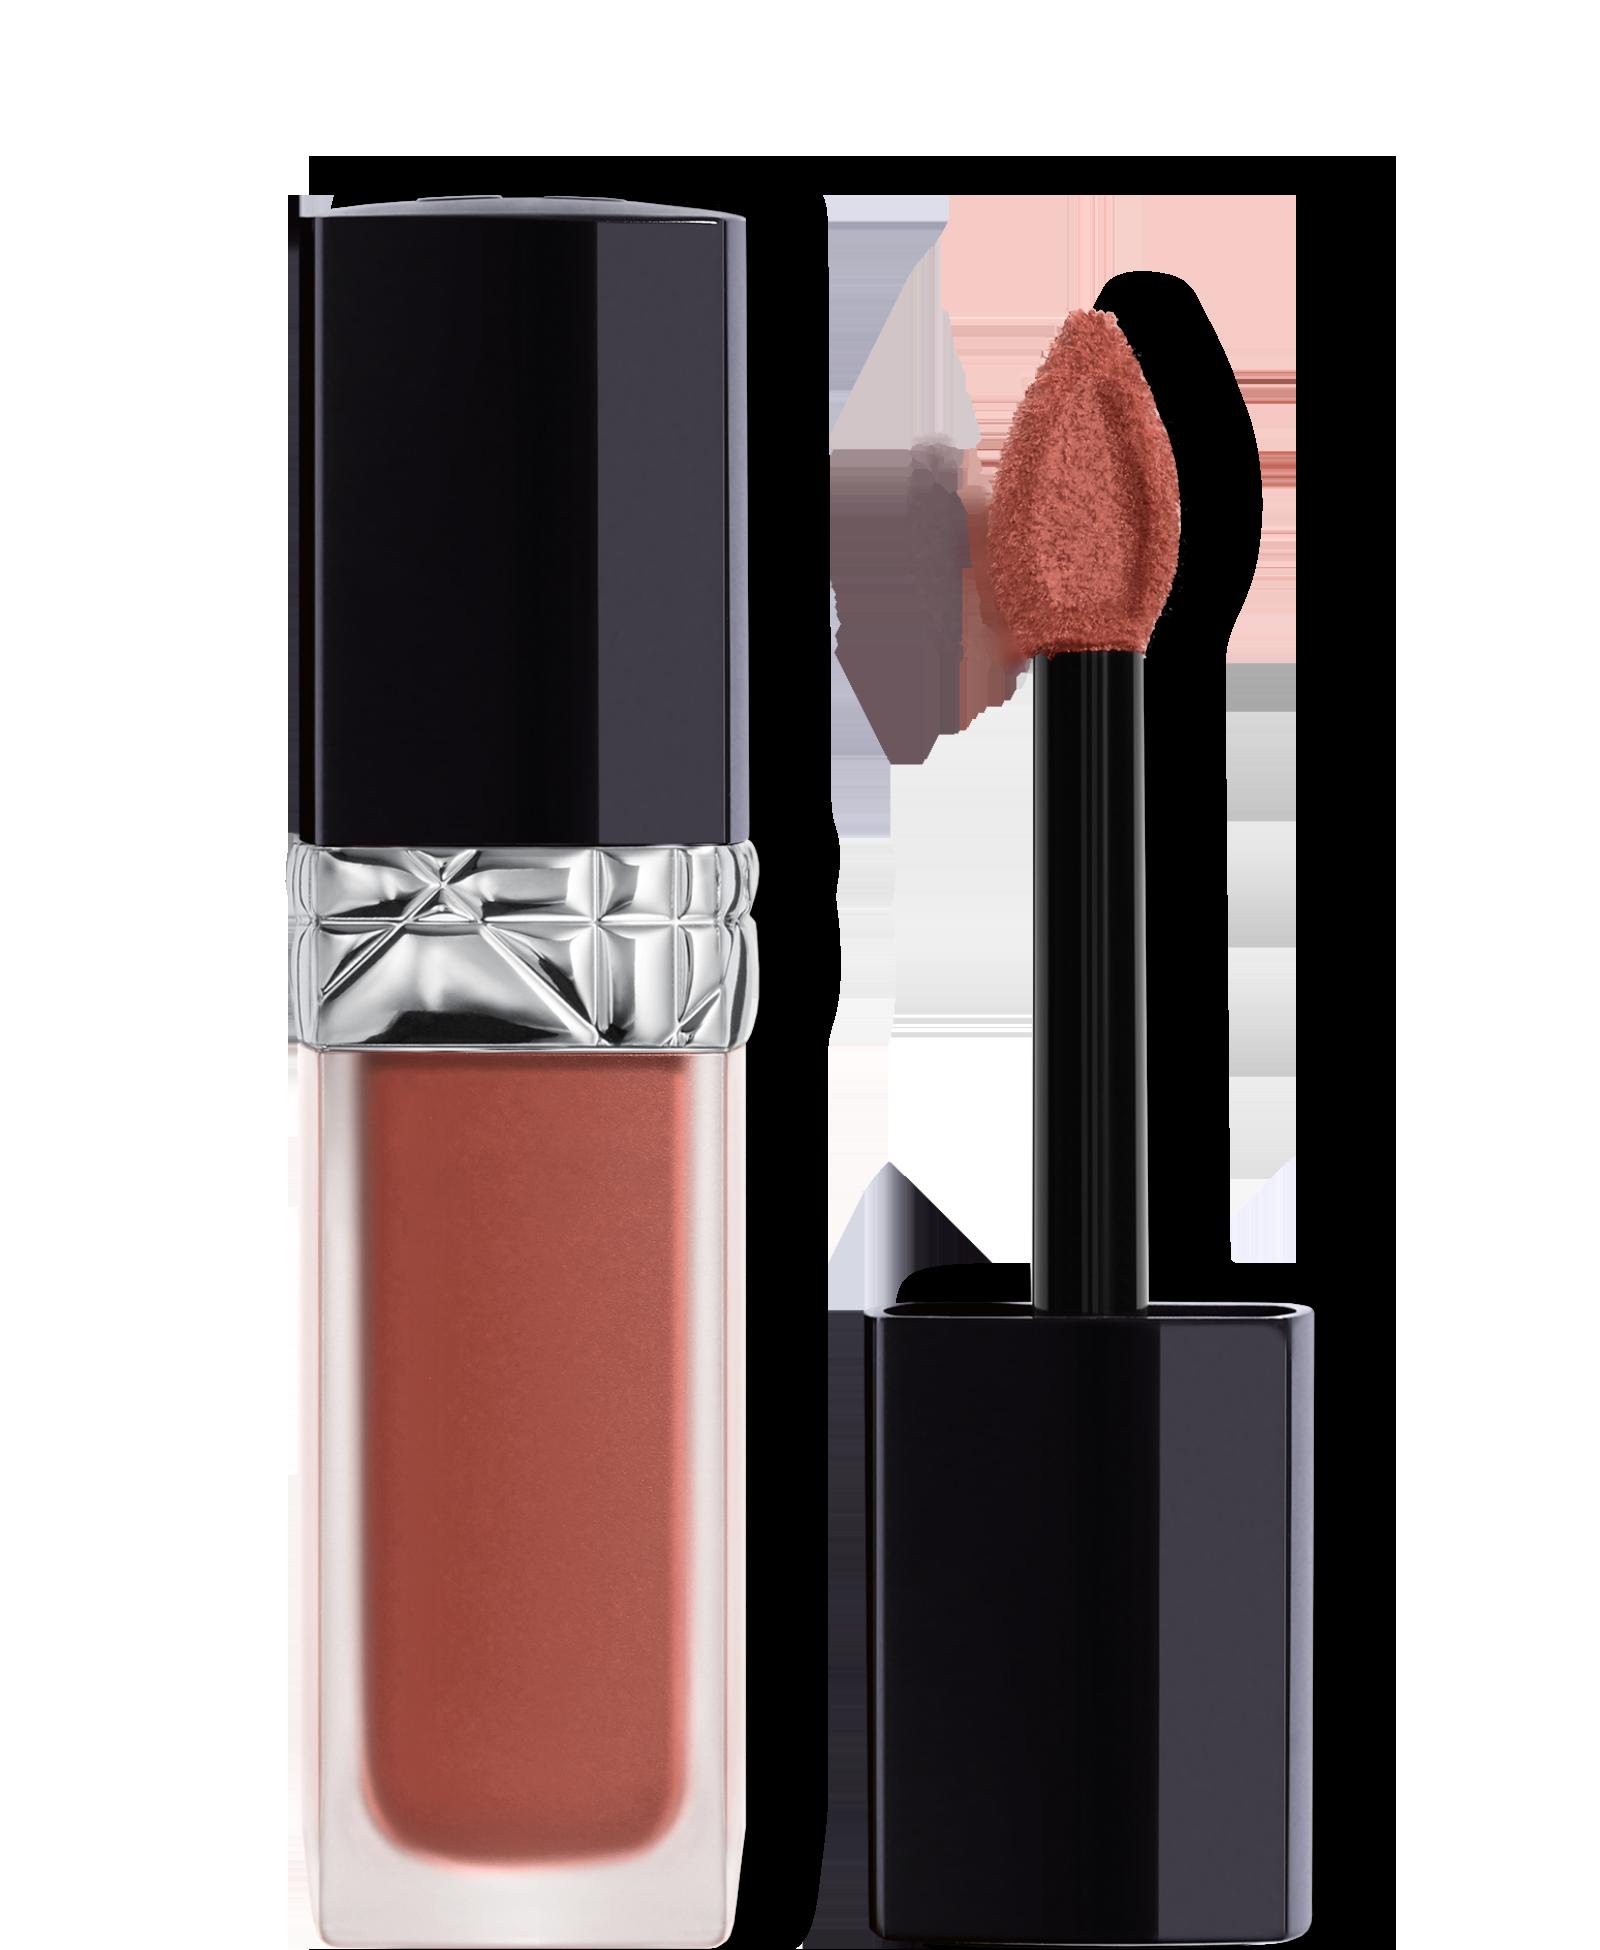 DIOR Rouge Dior Forever Liquid Lipstick, 200 forever dream